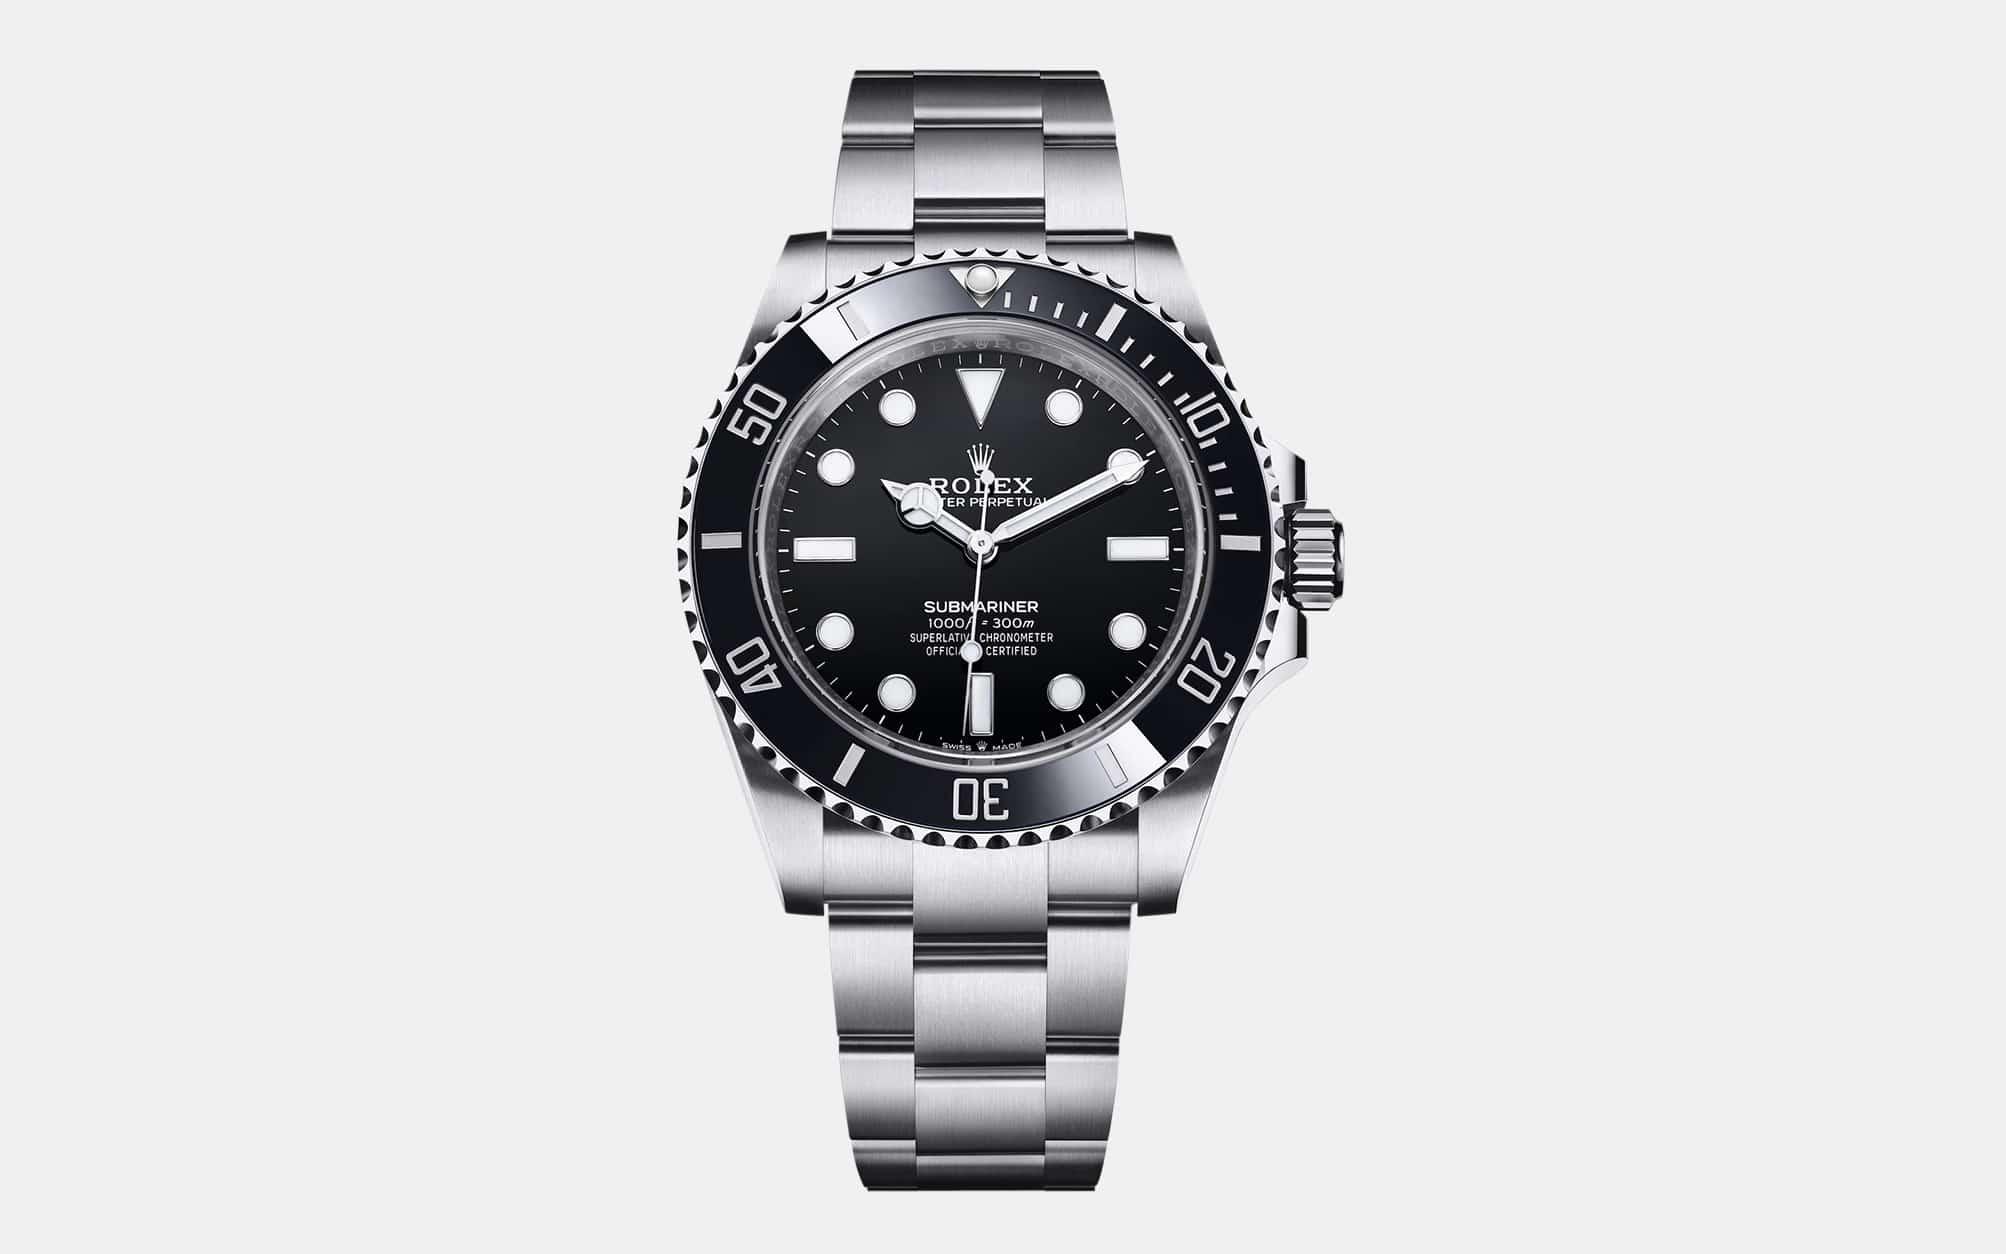 The New Rolex Submariner Ref. 124060